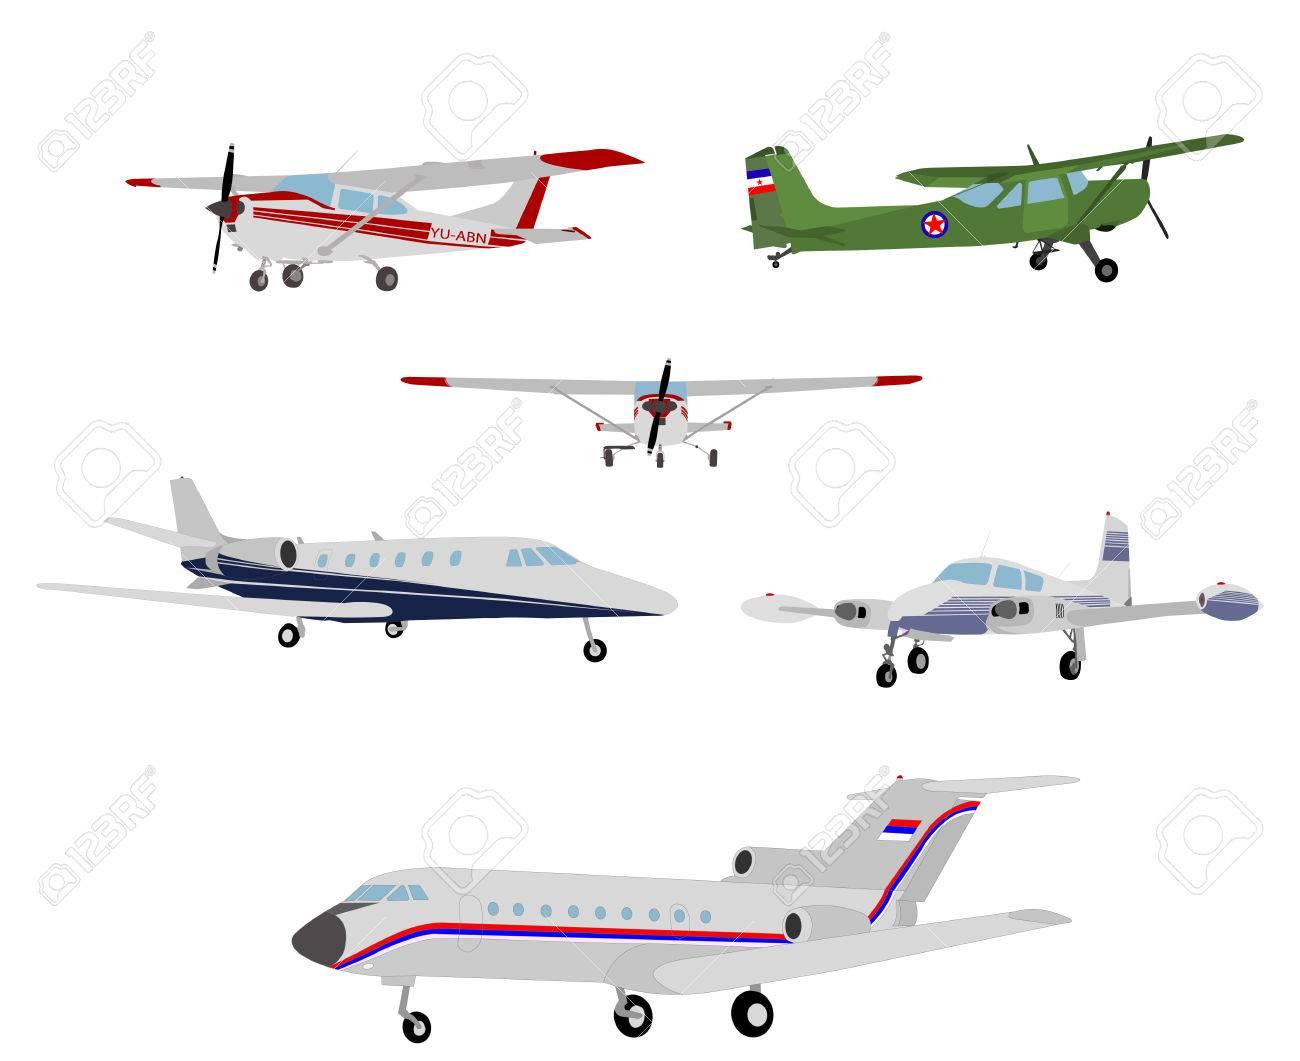 airplanes illustration - vector - 32611601